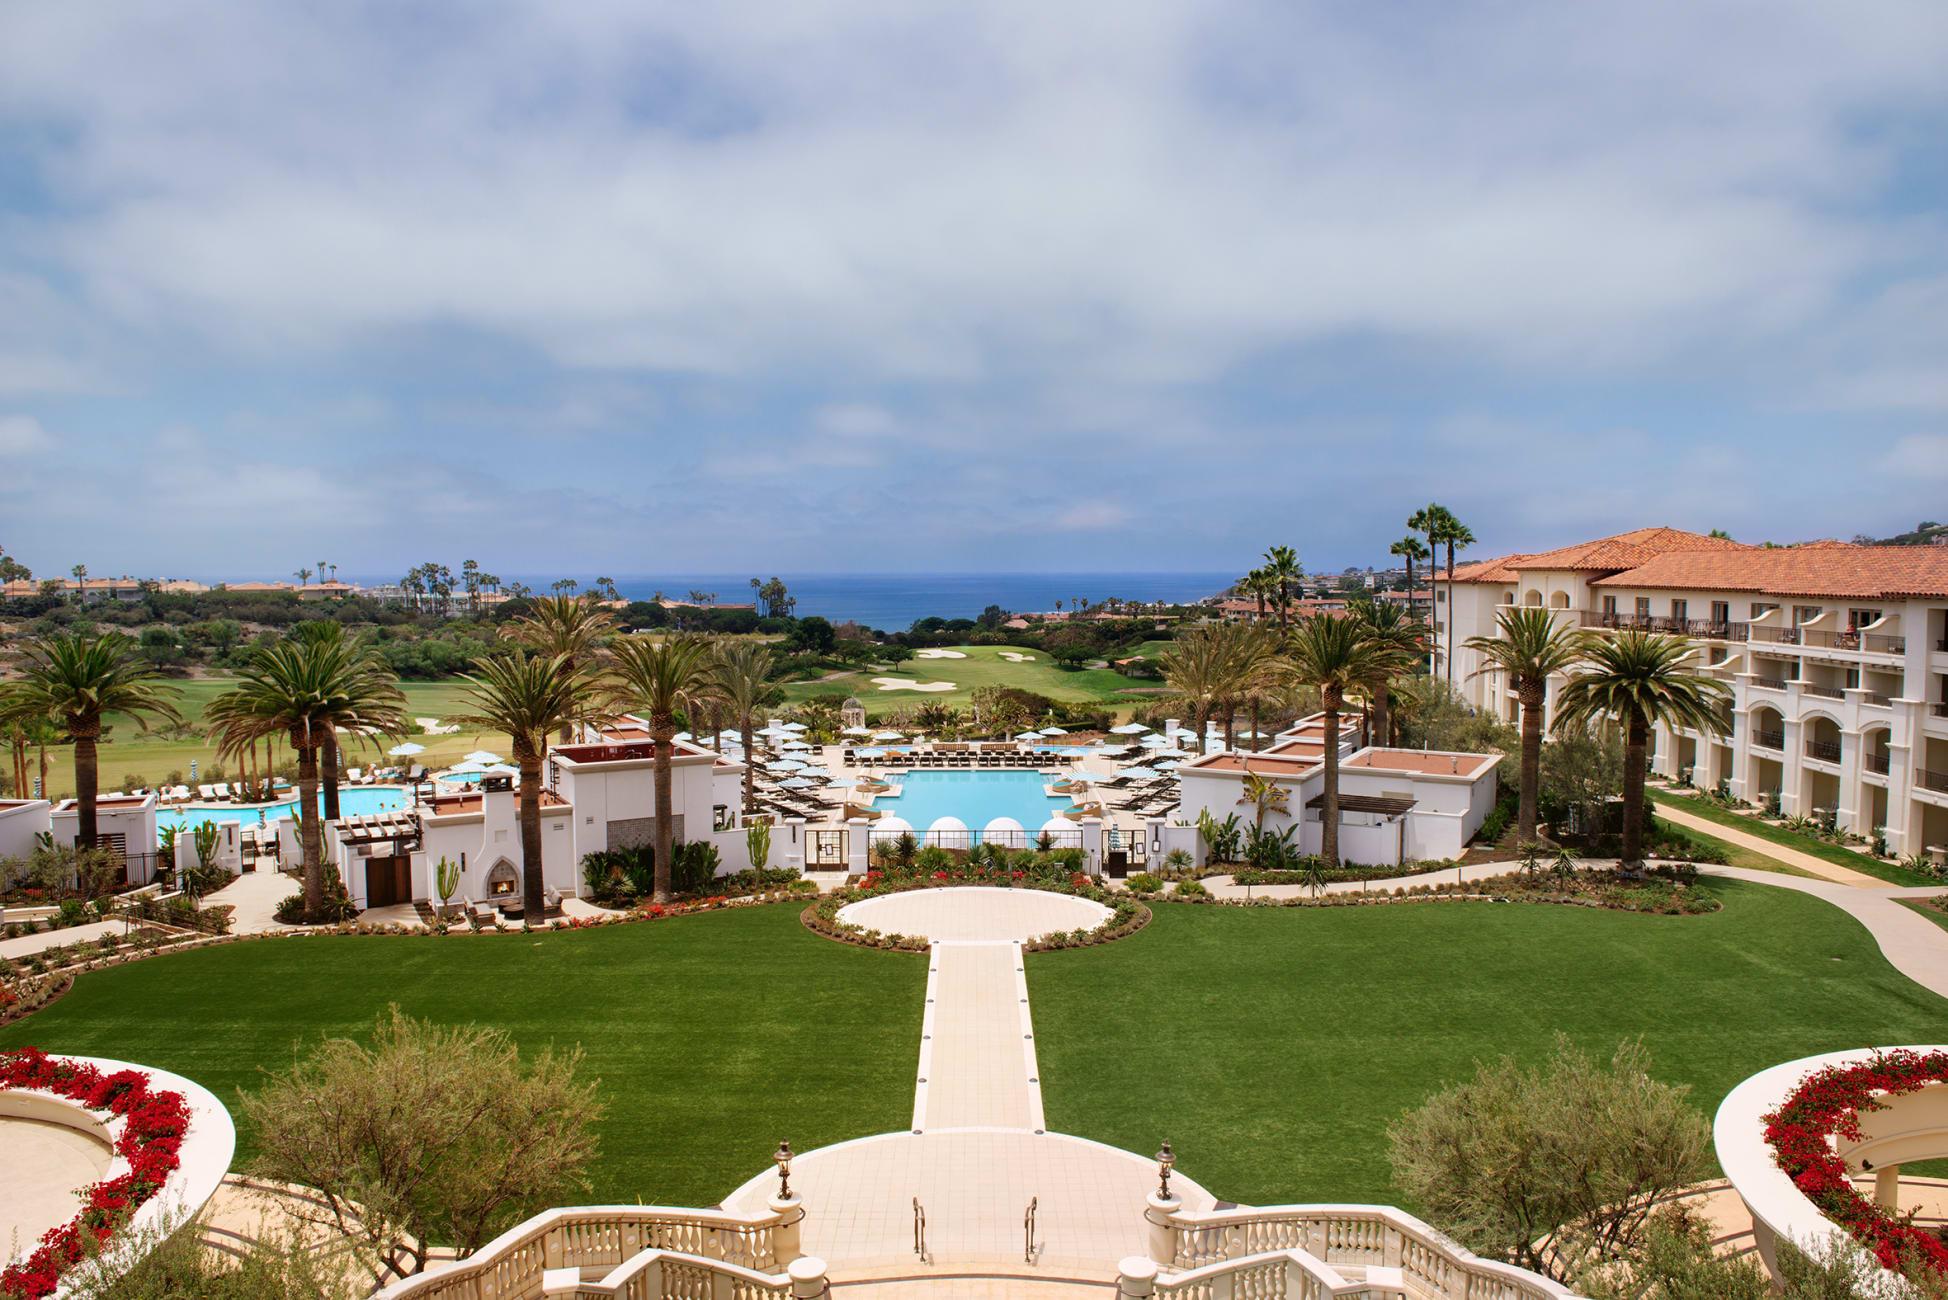 Resort Hotel Monarch Beach Dana